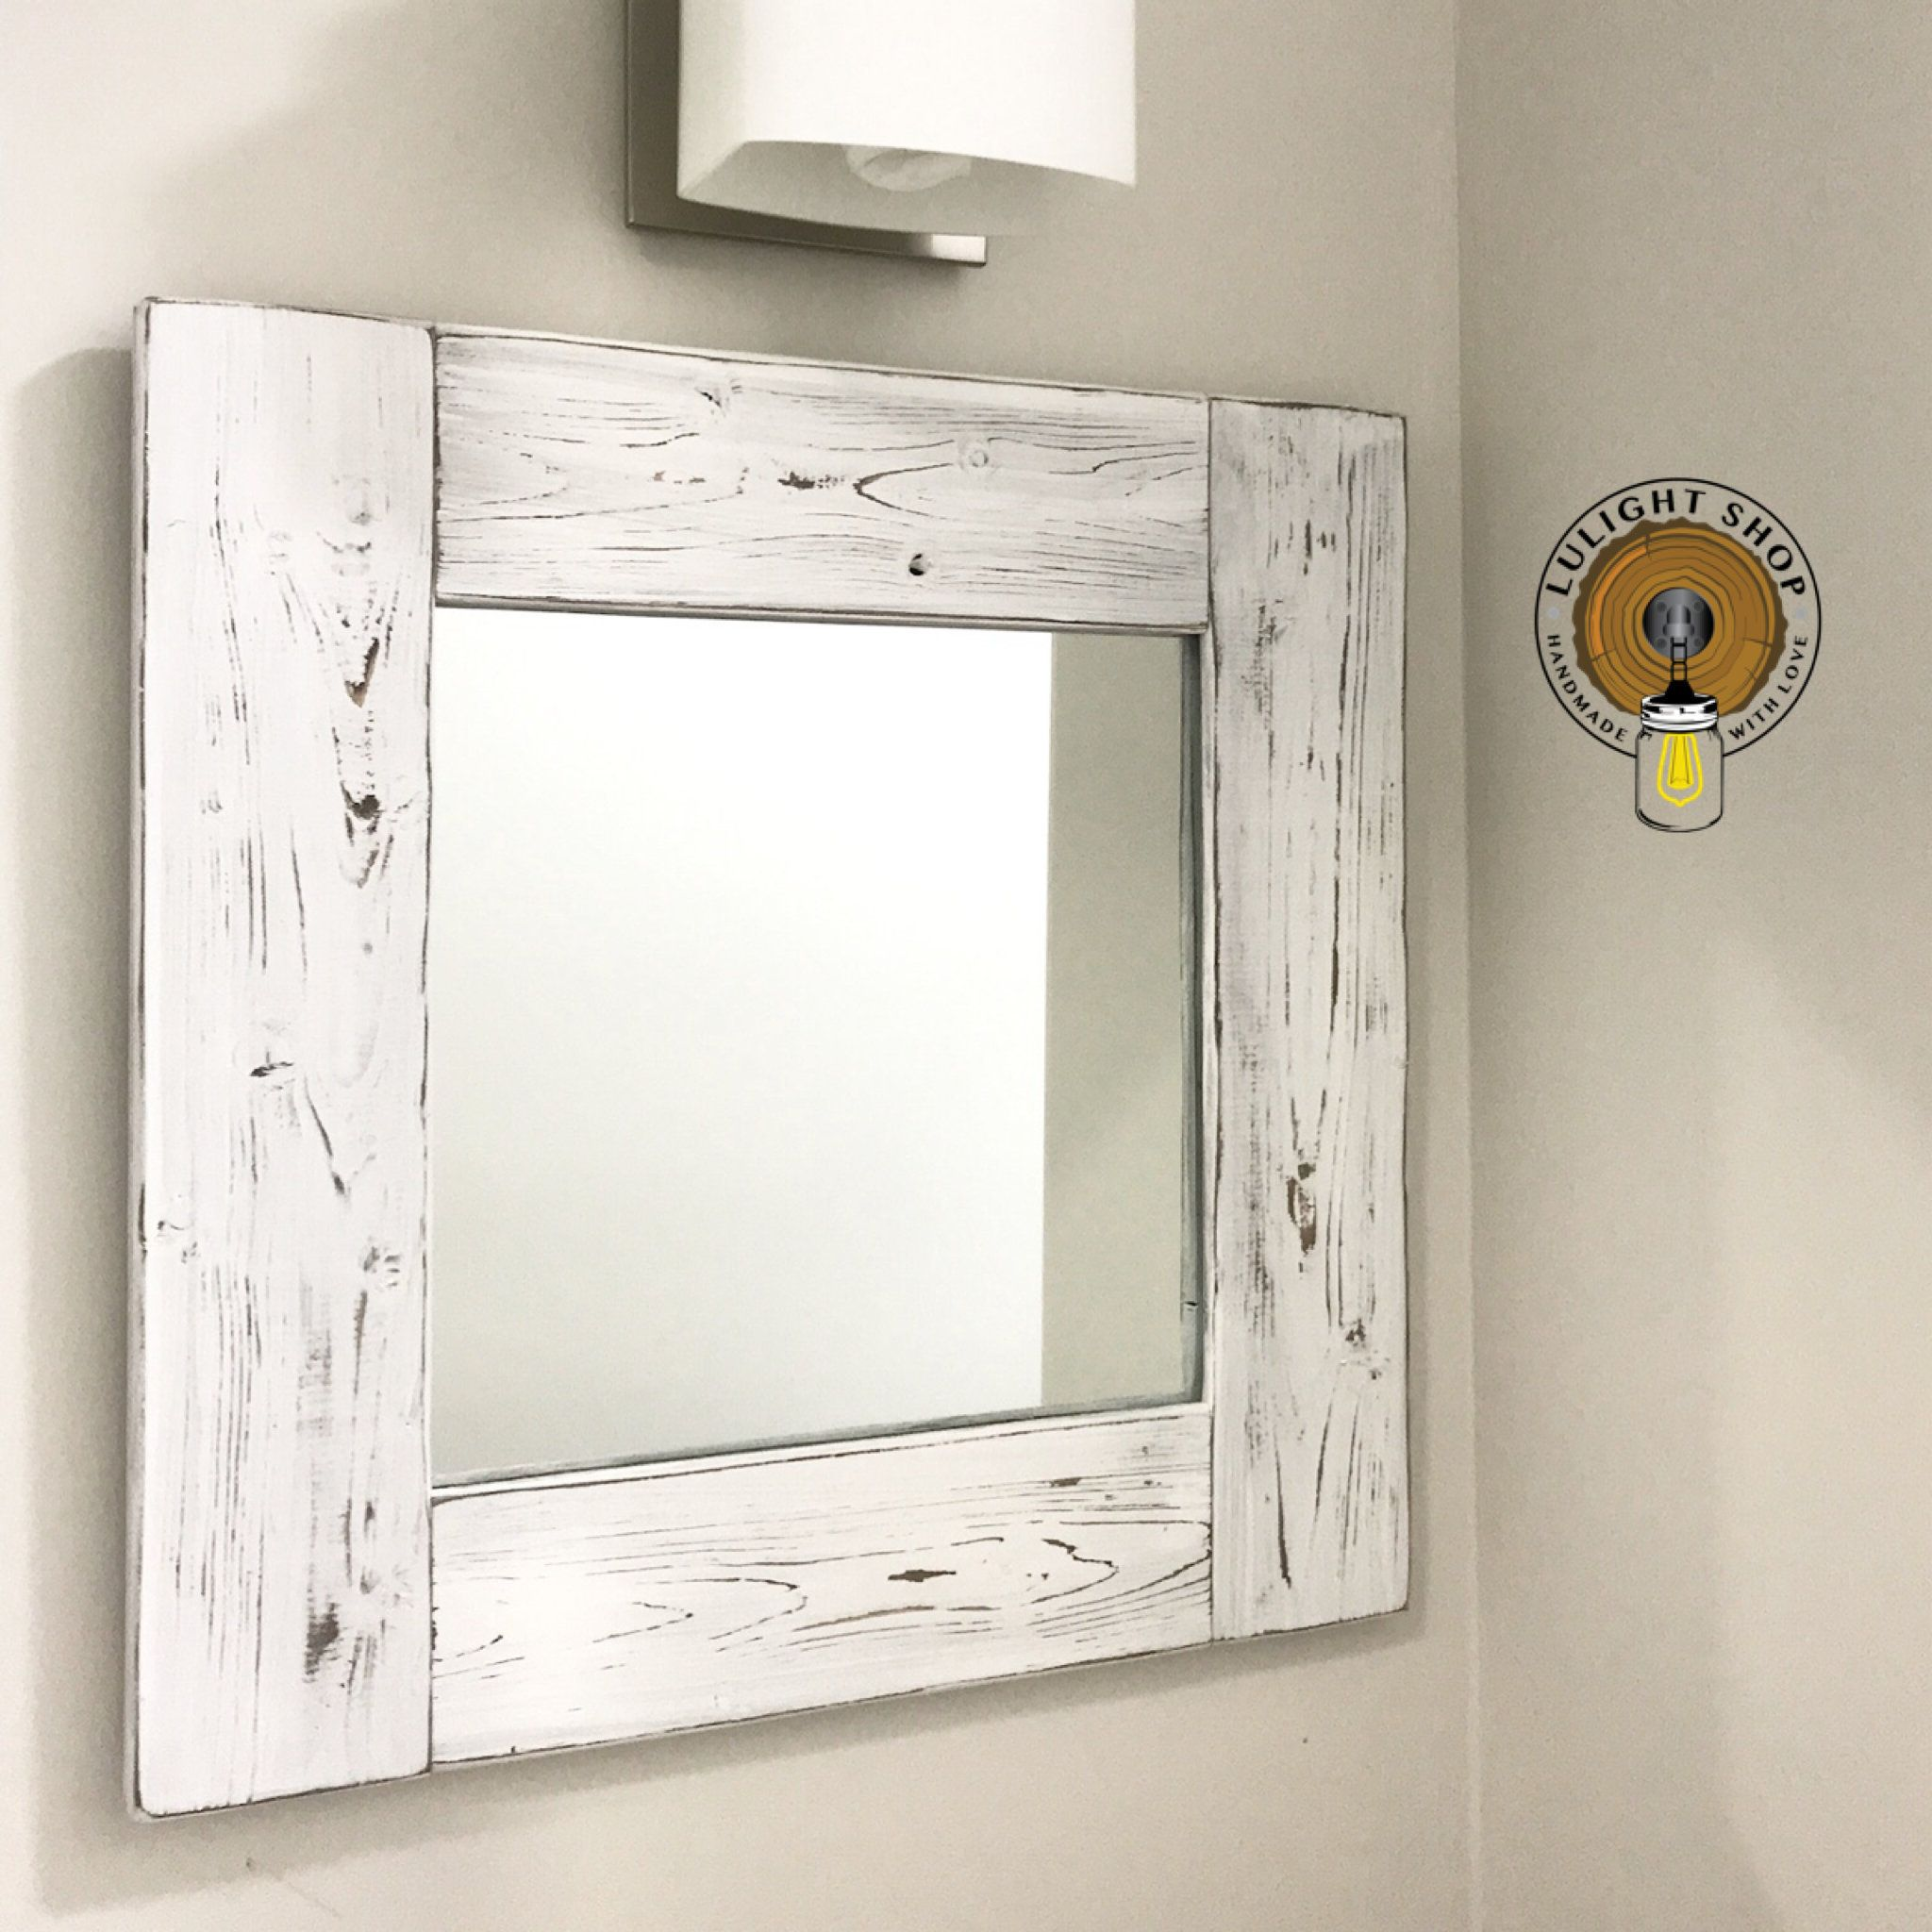 Whitewash Mirror Wood Frame Mirror White Wood Mirror Bathroom Mirror Wall Mirror Decorative Mirrors Sma Wood Framed Mirror Wood Wall Bathroom Wood Mirror